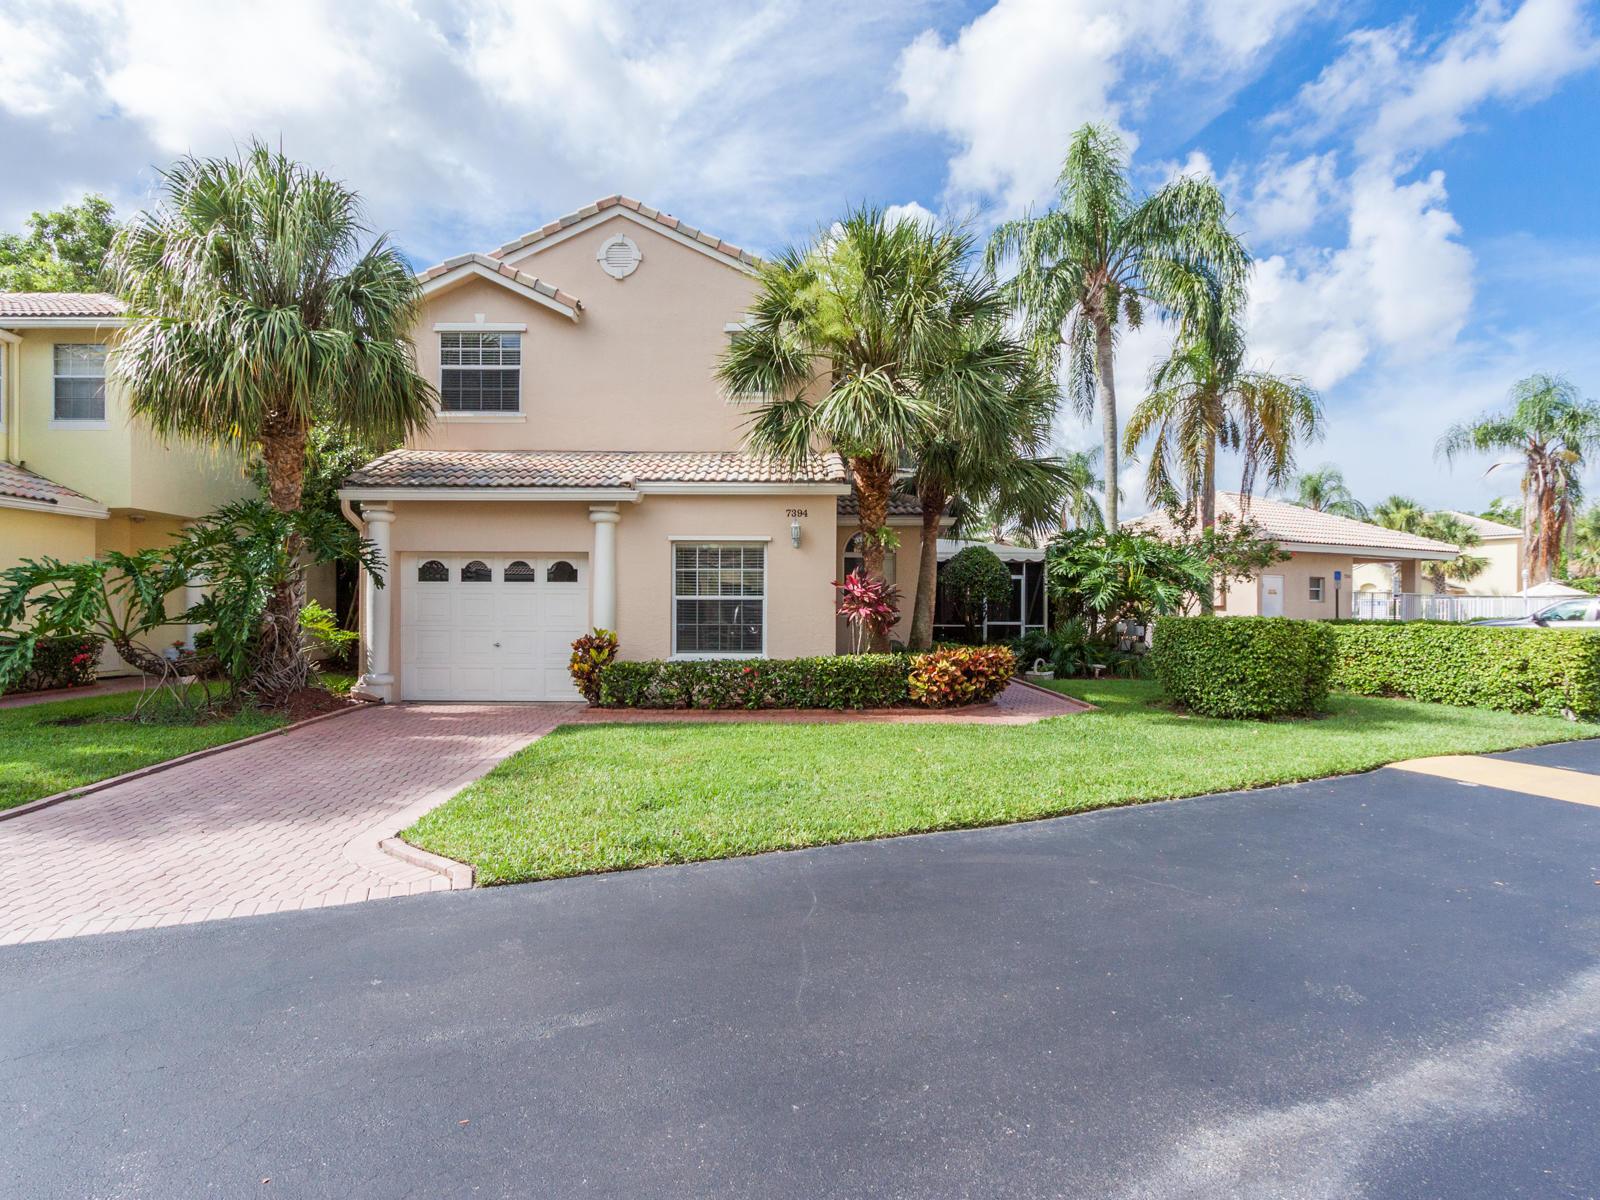 7394 Panache Way Boca Raton, FL 33433